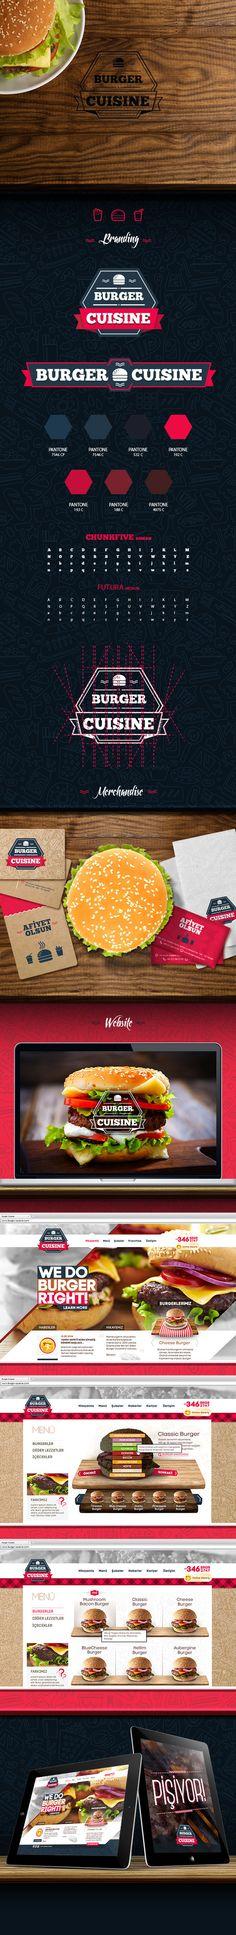 Burger Cuisine by Caner Çolakoğlu, via Behance